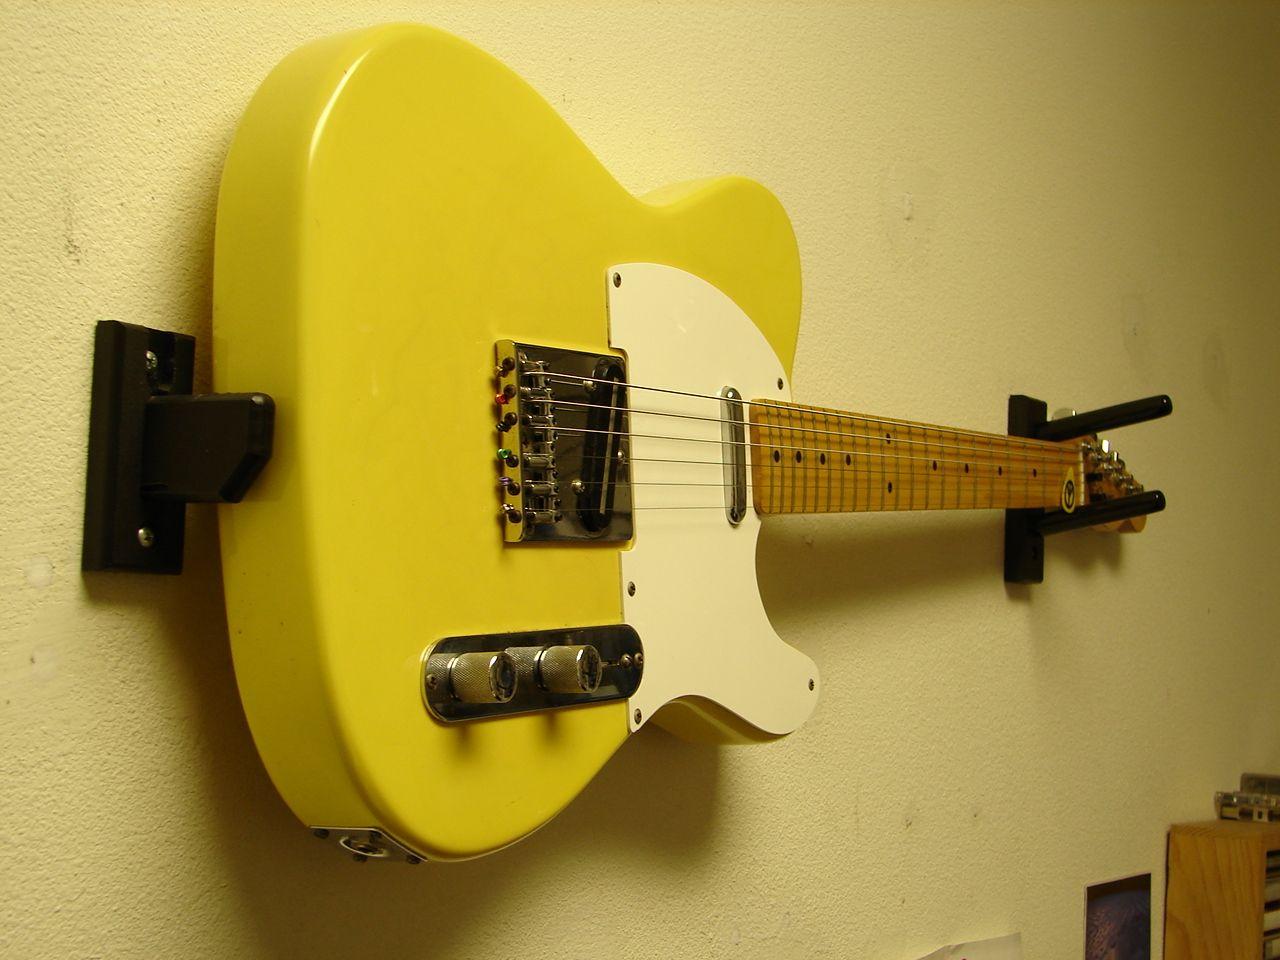 Guitar Wall Hanger   Guitars, Wall mount and Guitar wall